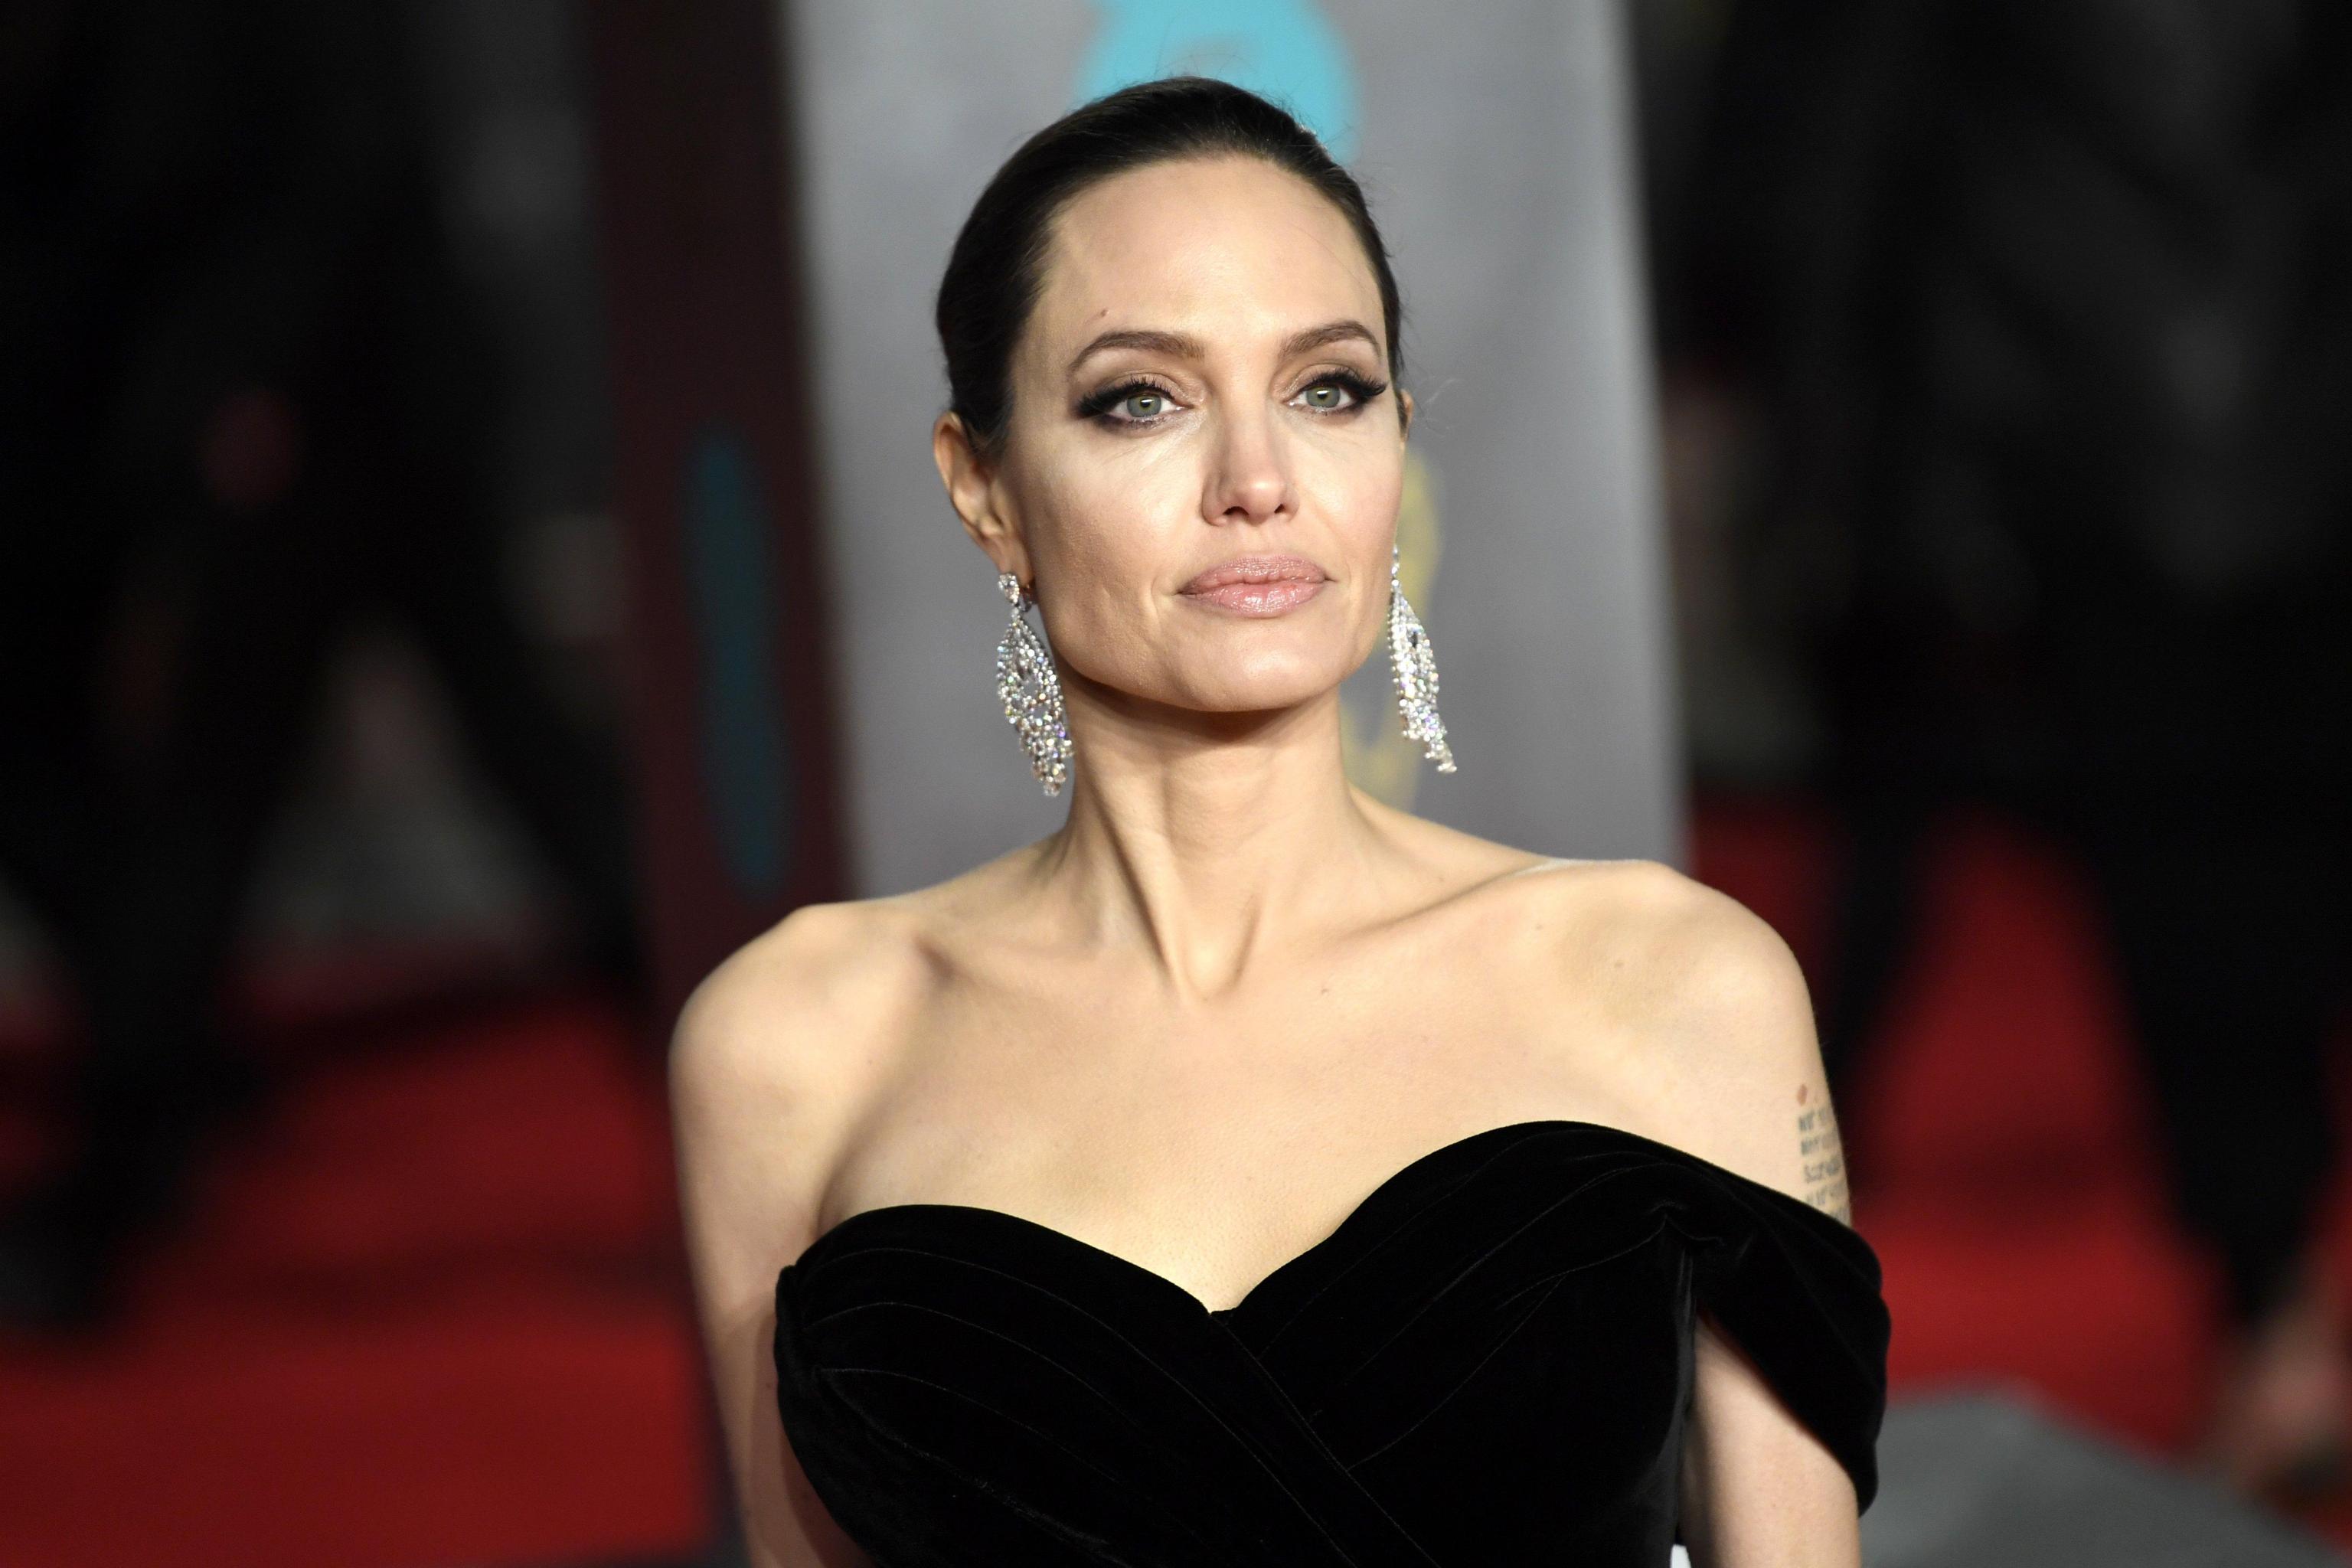 Angelina Jolie attrici più pagate 2018